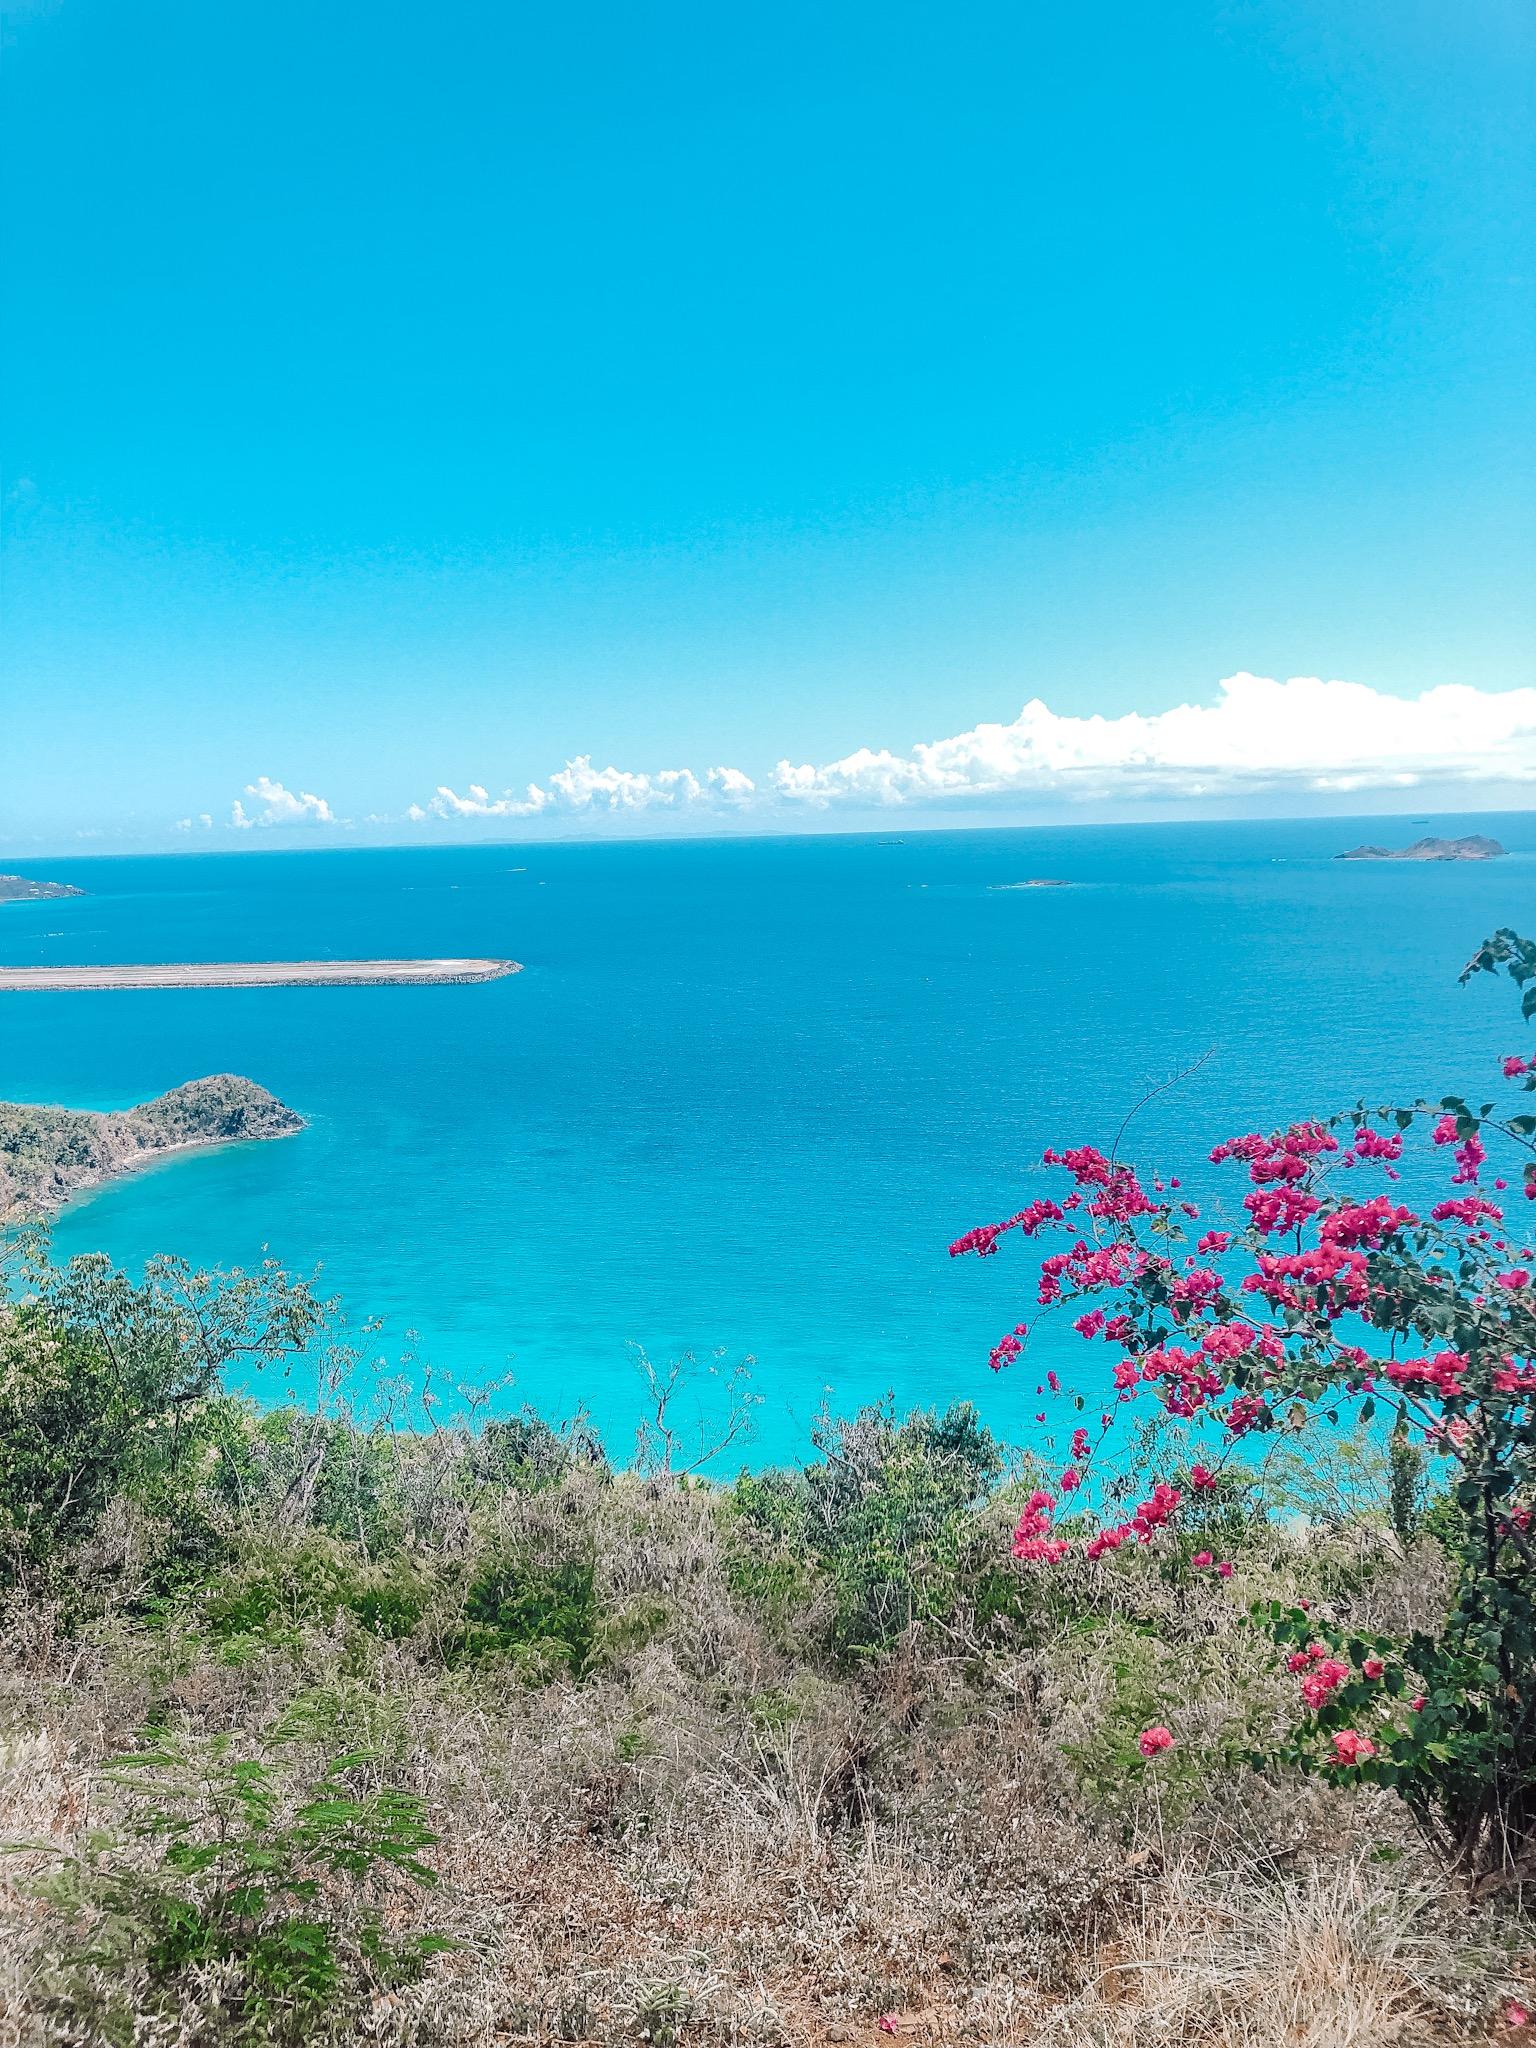 Photo Diary: Royal Caribbean's Oasis of the Seas (Visiting Nassau, St. Thomas, St. Marteen)